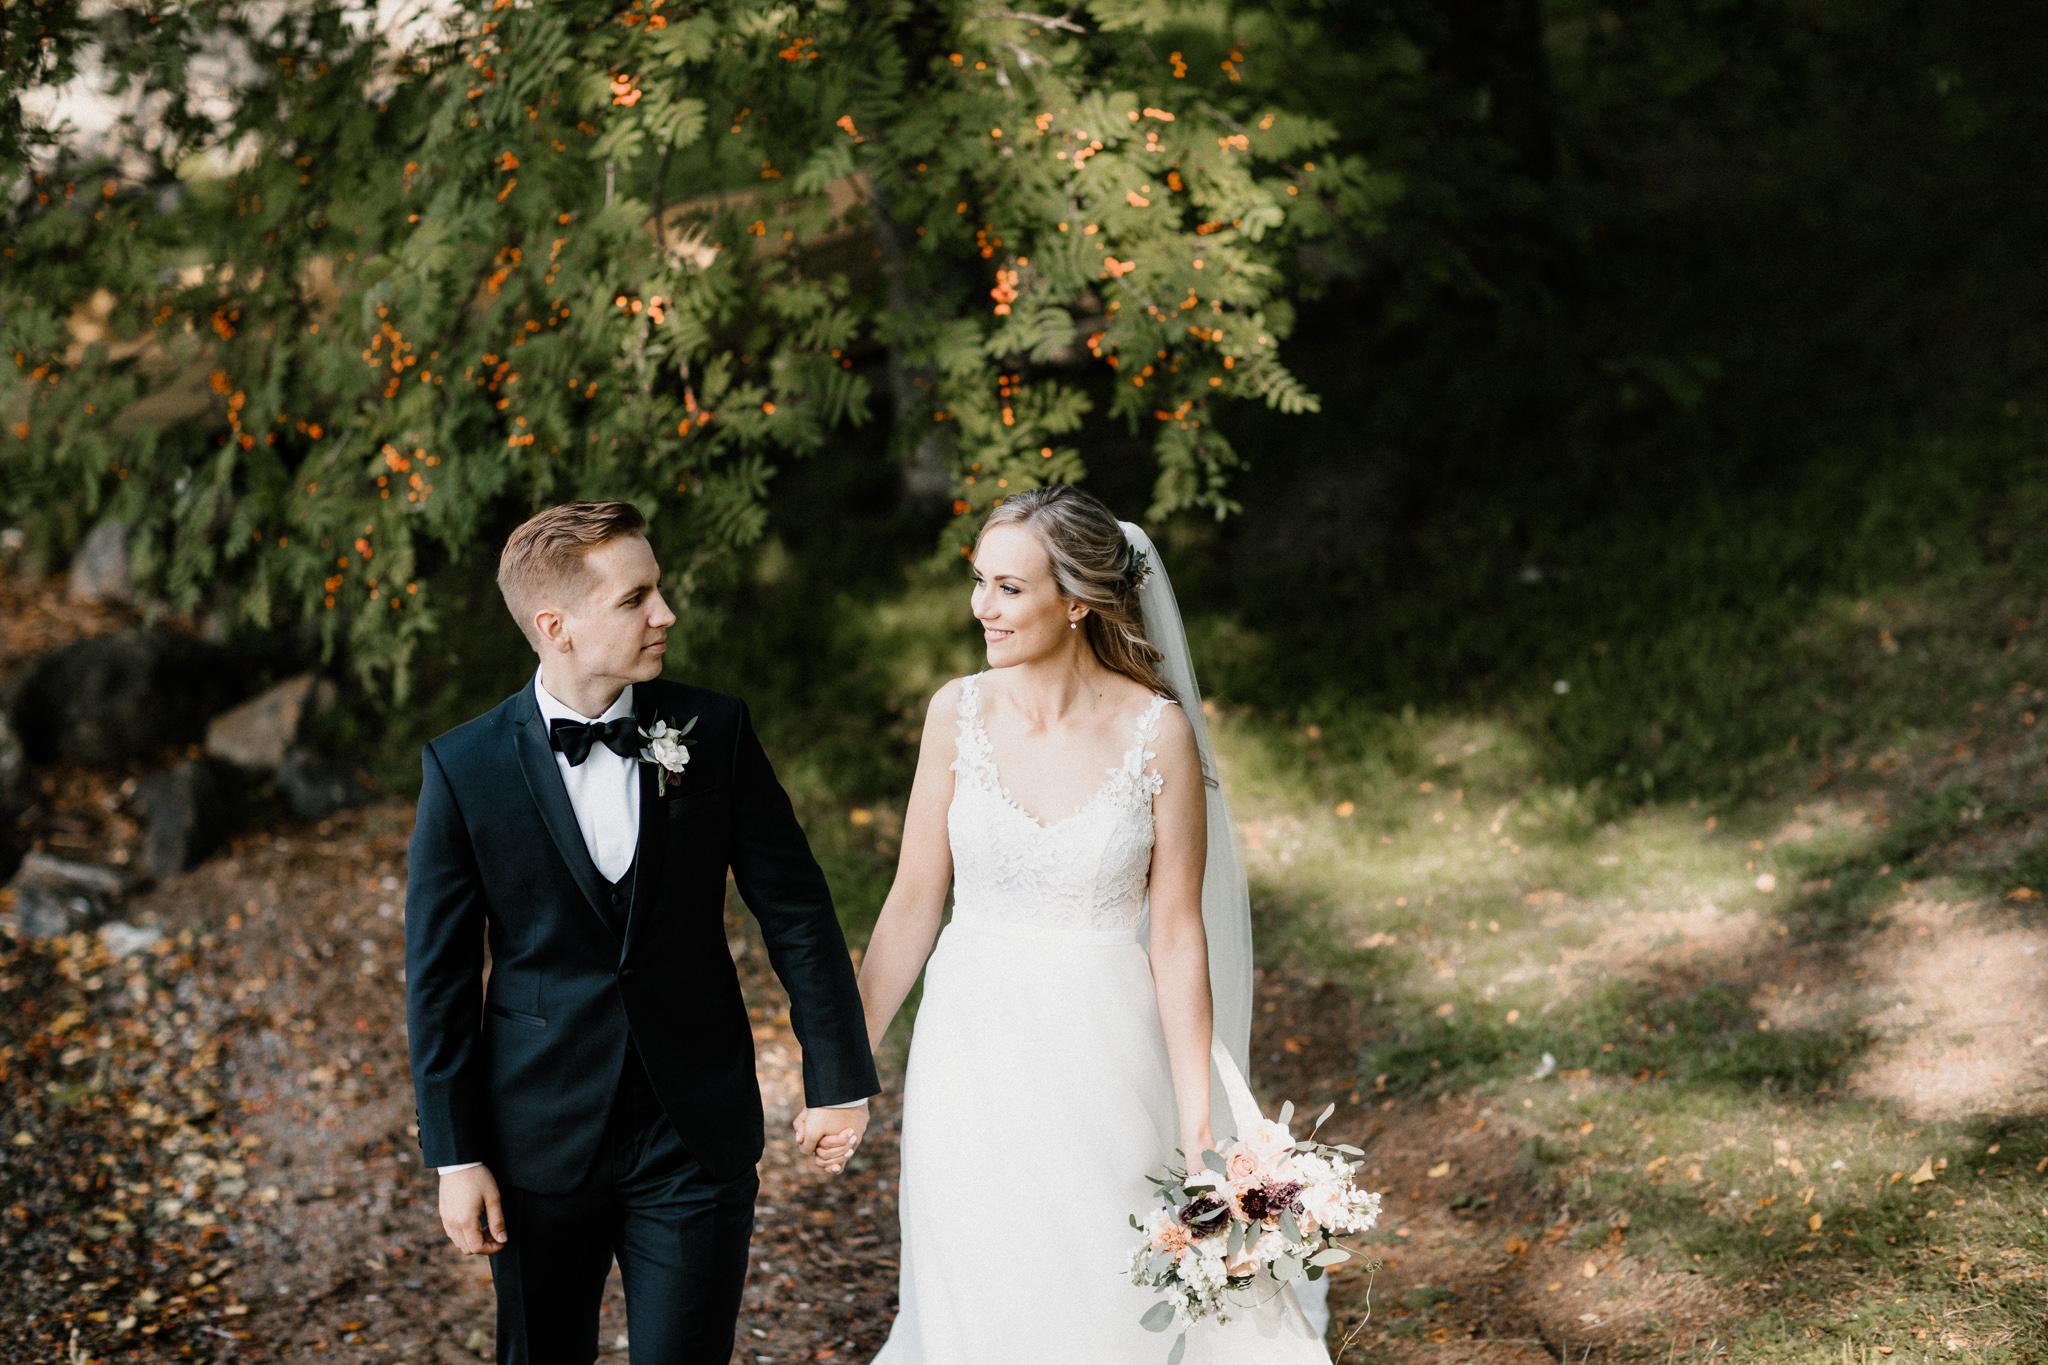 Johanna + Mikko - Tampere - Photo by Patrick Karkkolainen Wedding Photographer-31.jpg